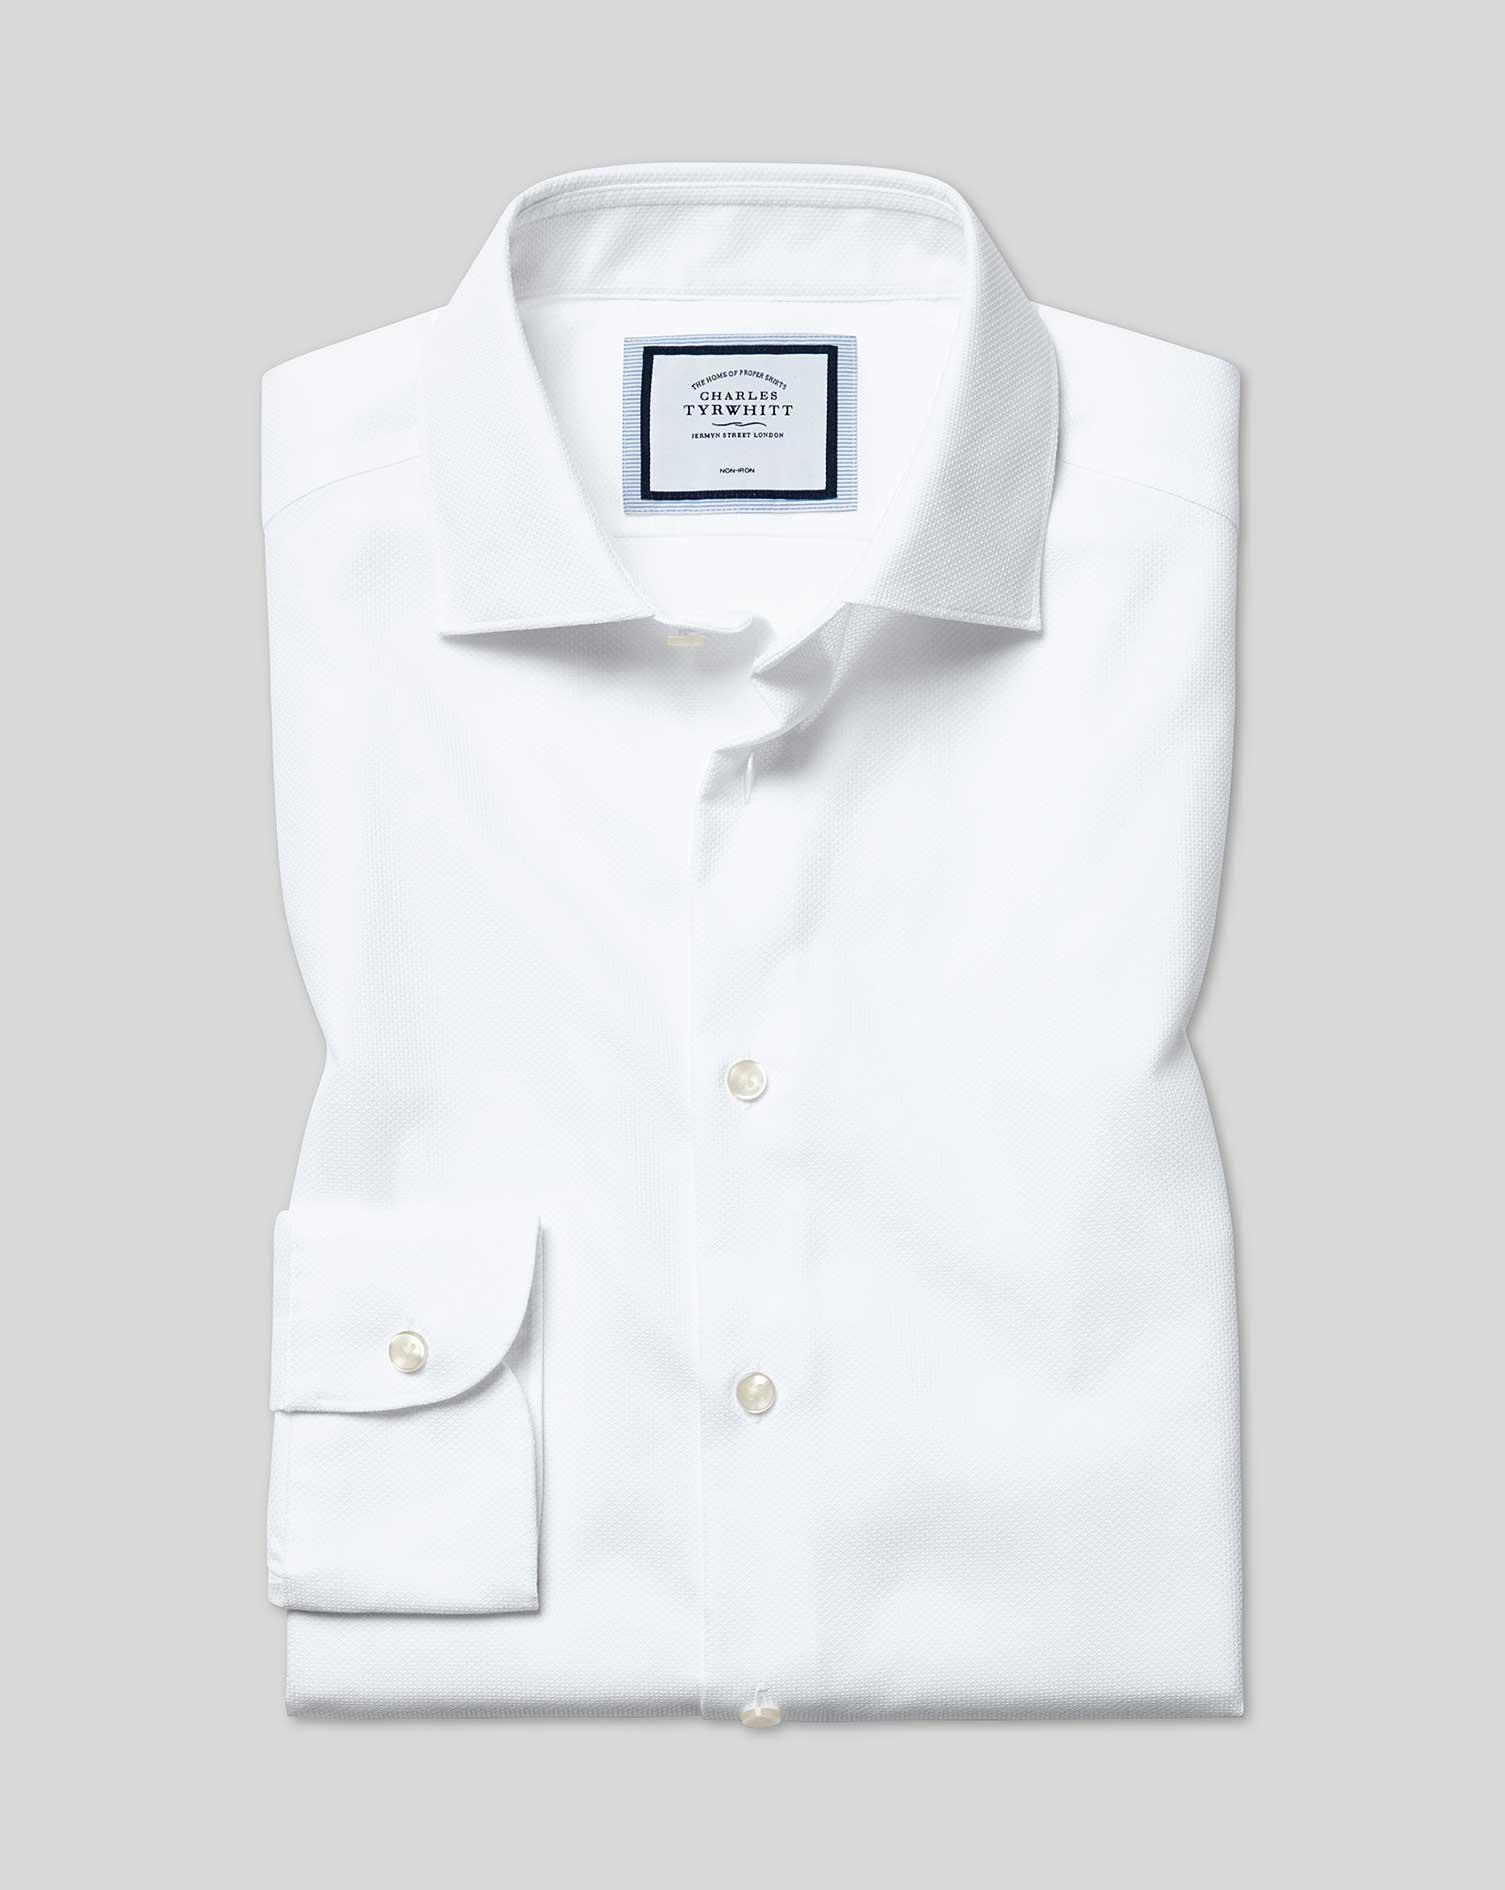 Cotton Extra Slim Fit Non-Iron Natural Stretch White Shirt